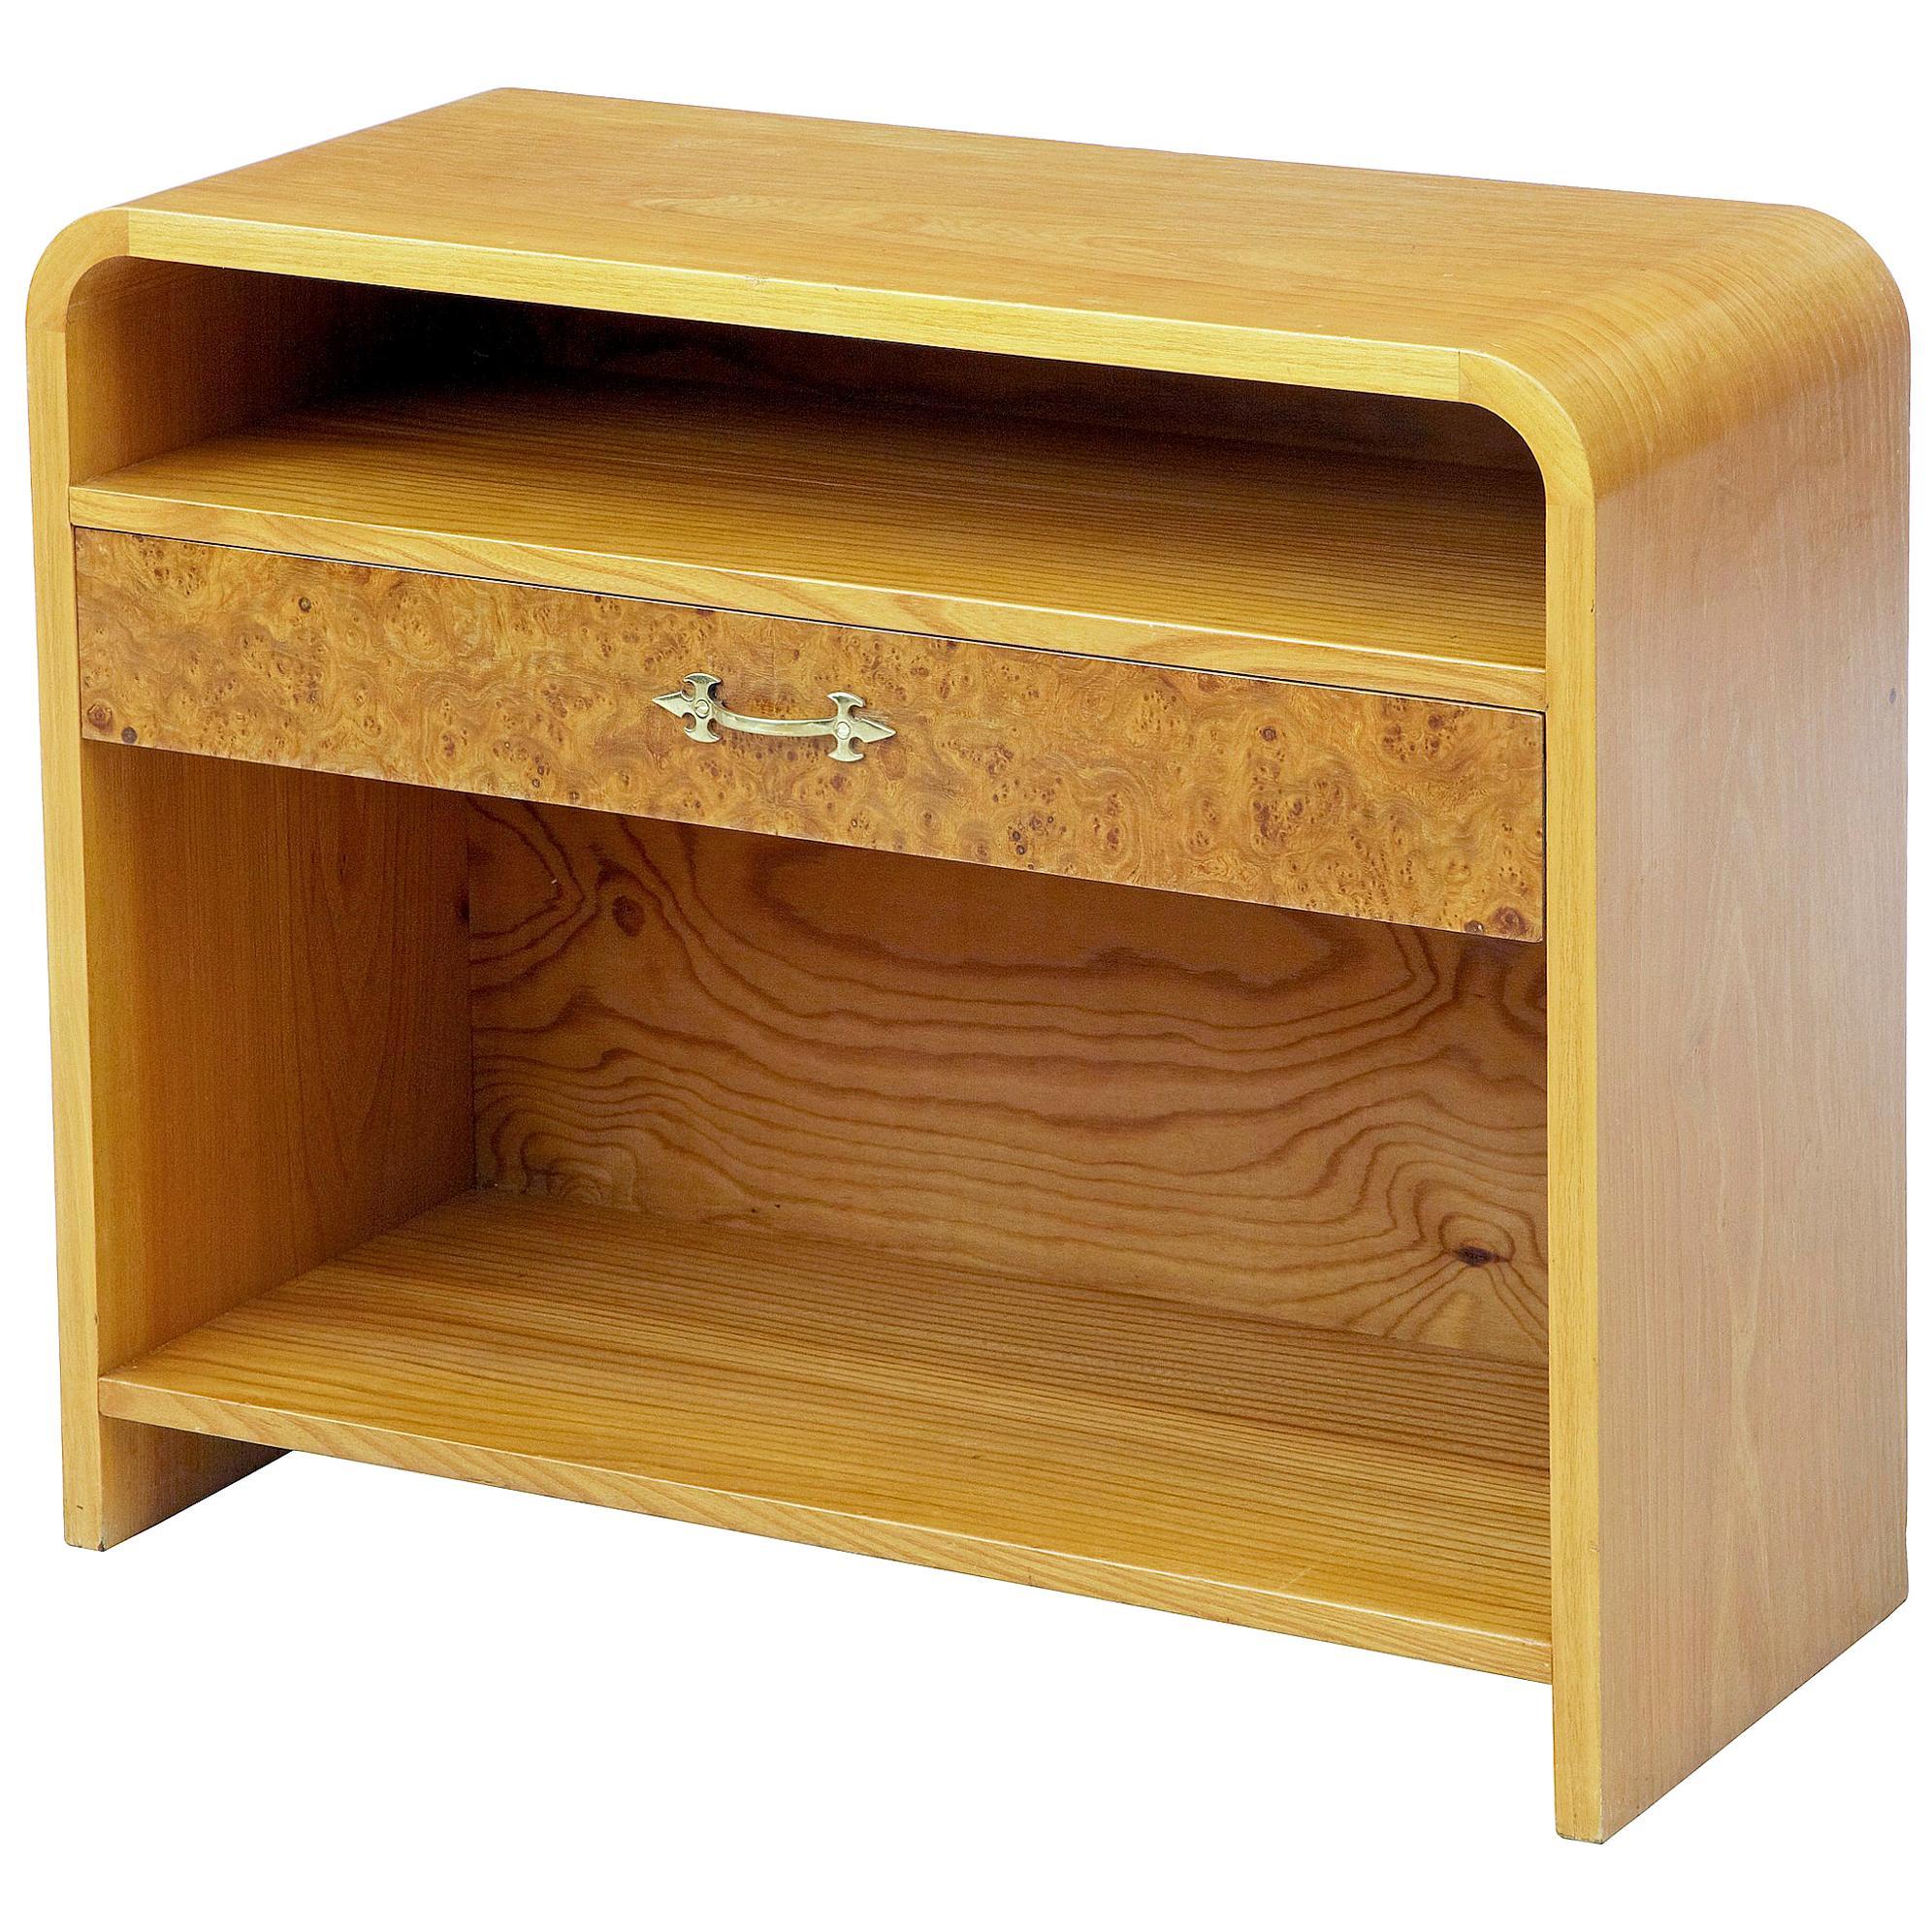 Mid-20th Century Scandinavian Shaped Birch Bedside Table